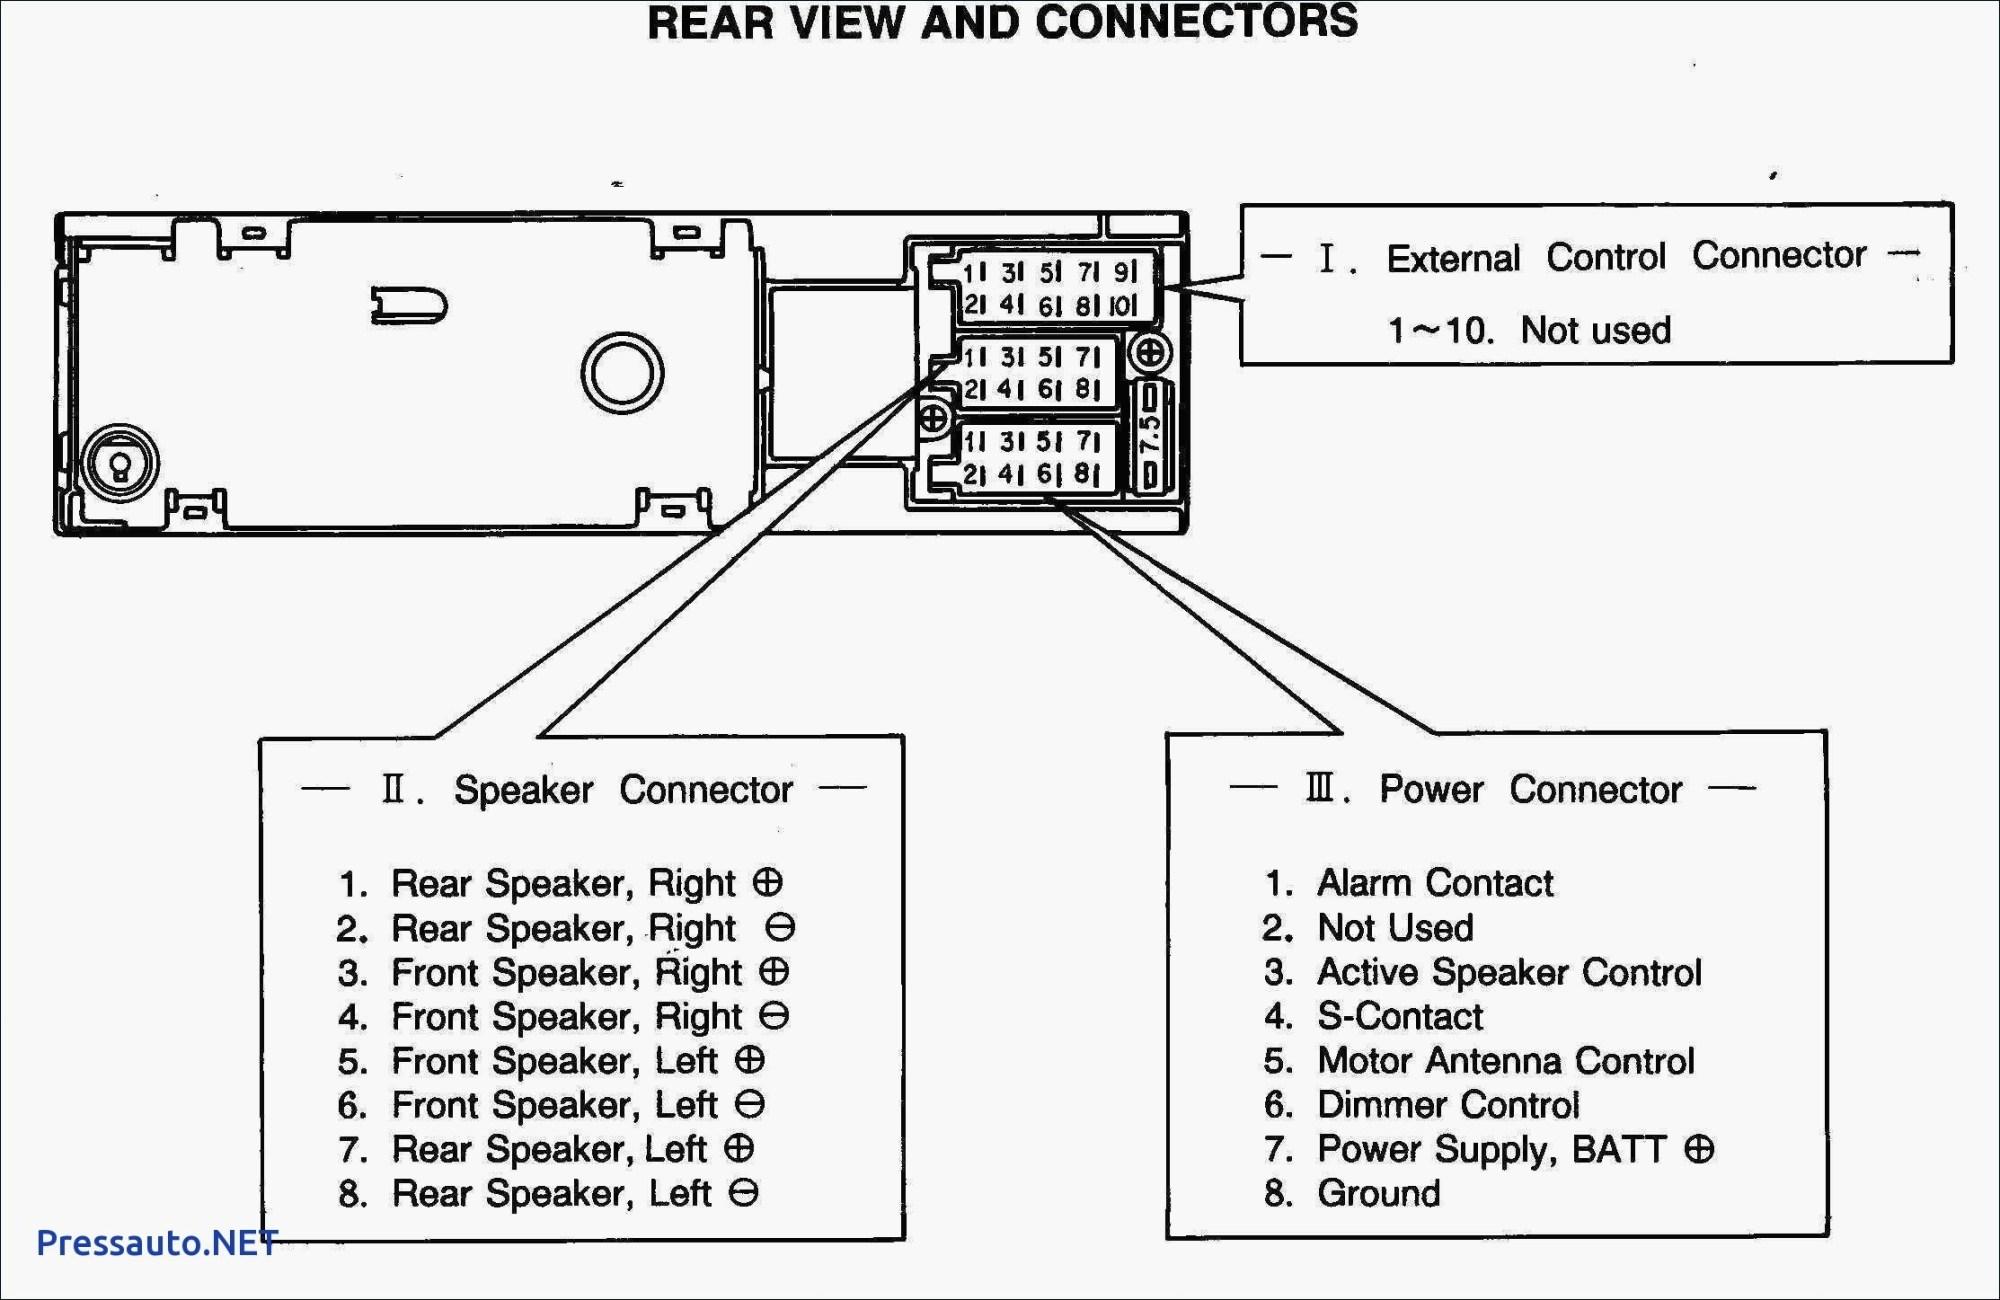 hight resolution of 2000 jetta 2 8 engine diagram example electrical wiring diagram u2022 rh 162 212 157 63